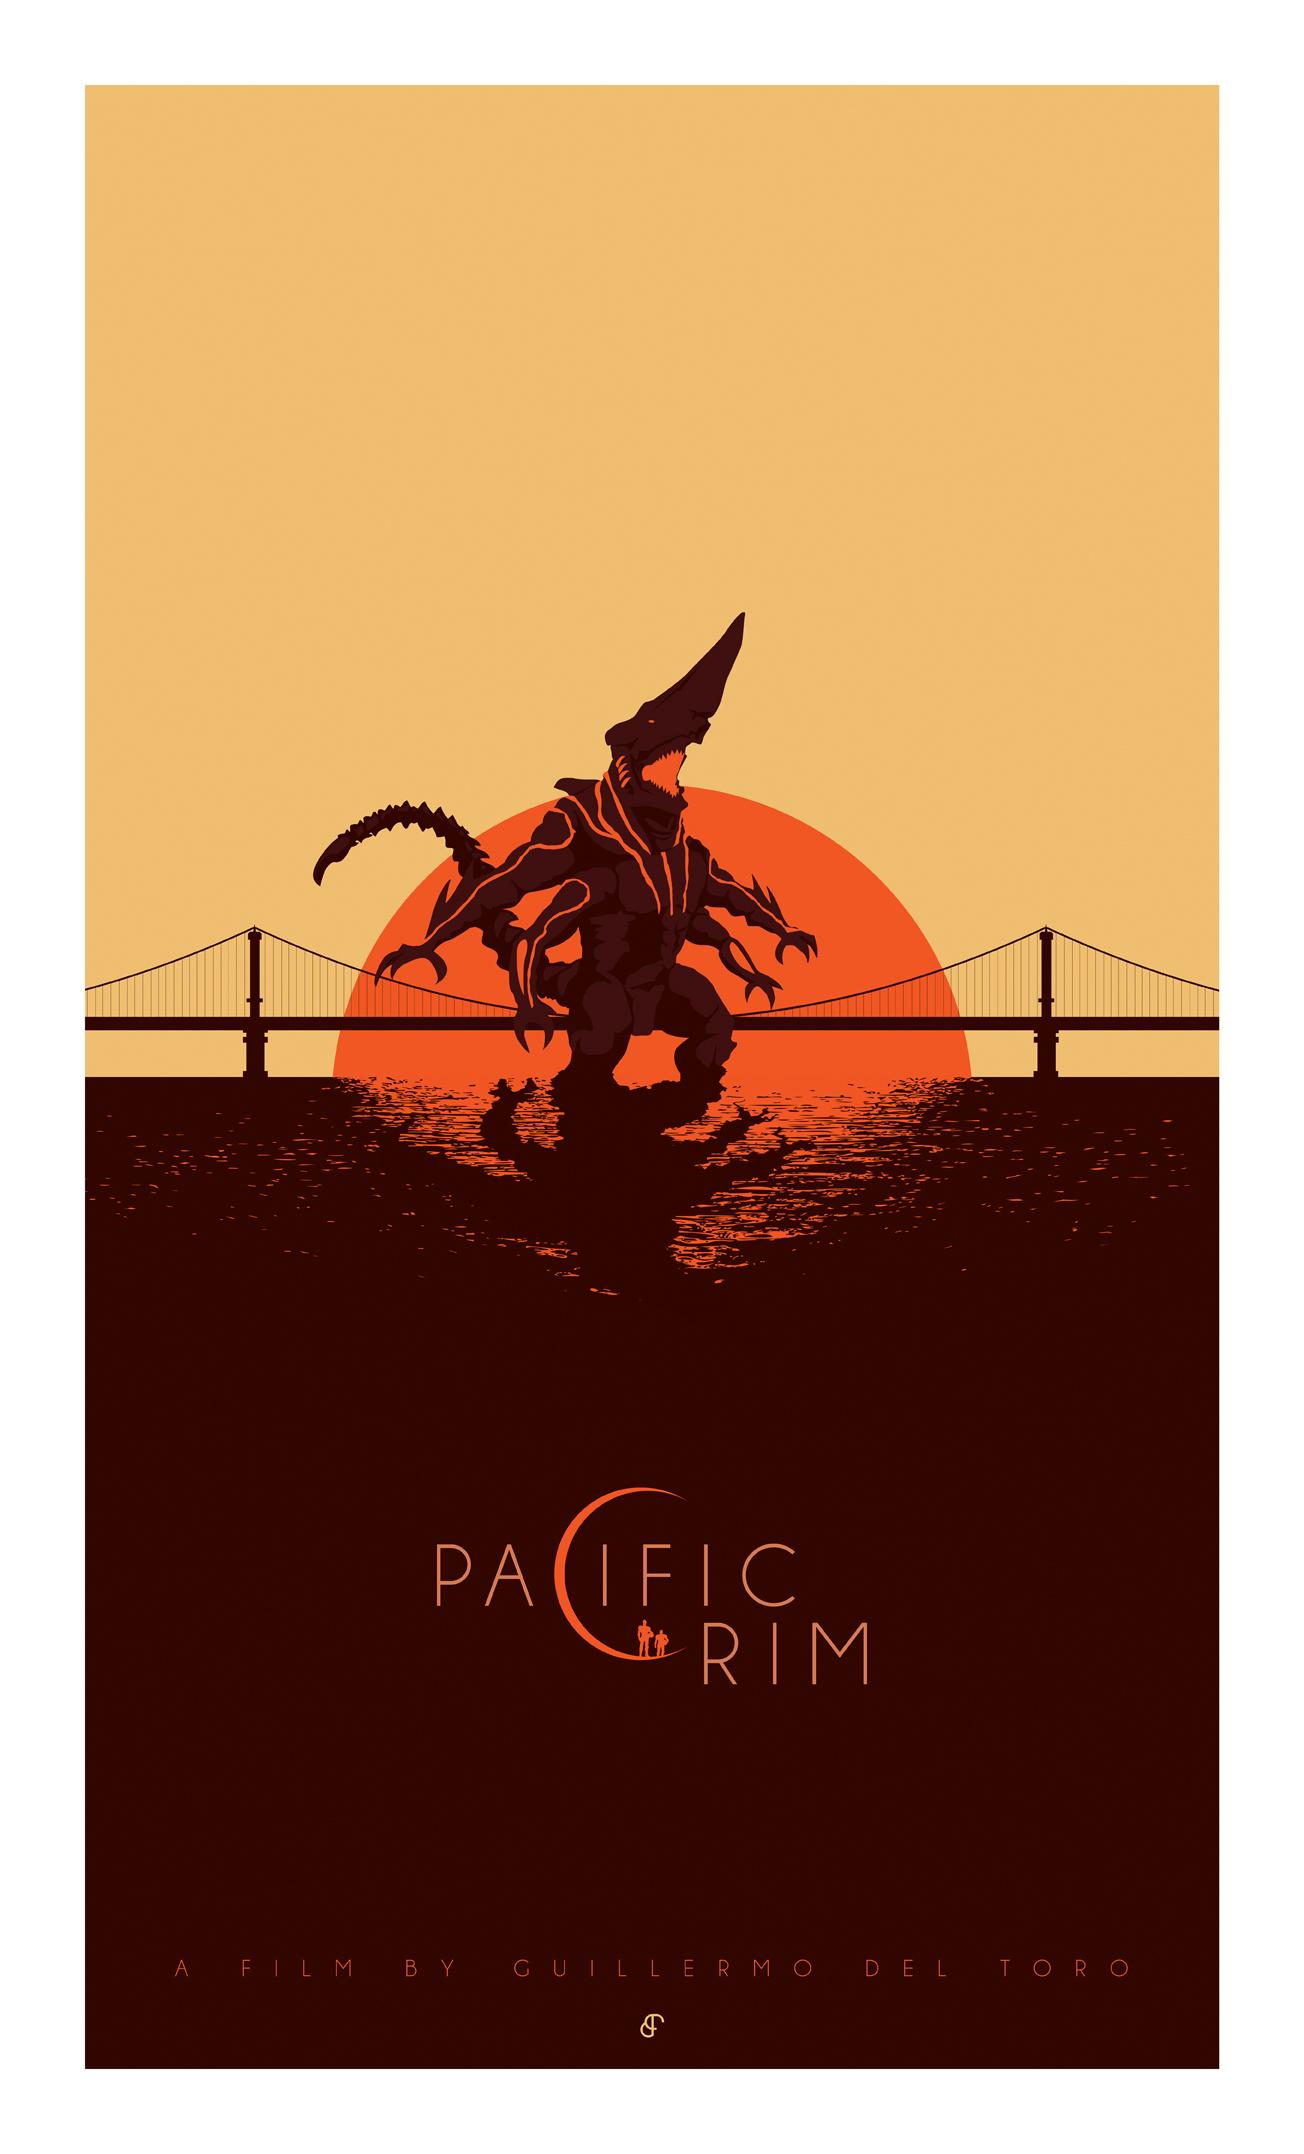 Pacific Rim Kaiju Poster EXCLUSIVE!: Poster Pos...